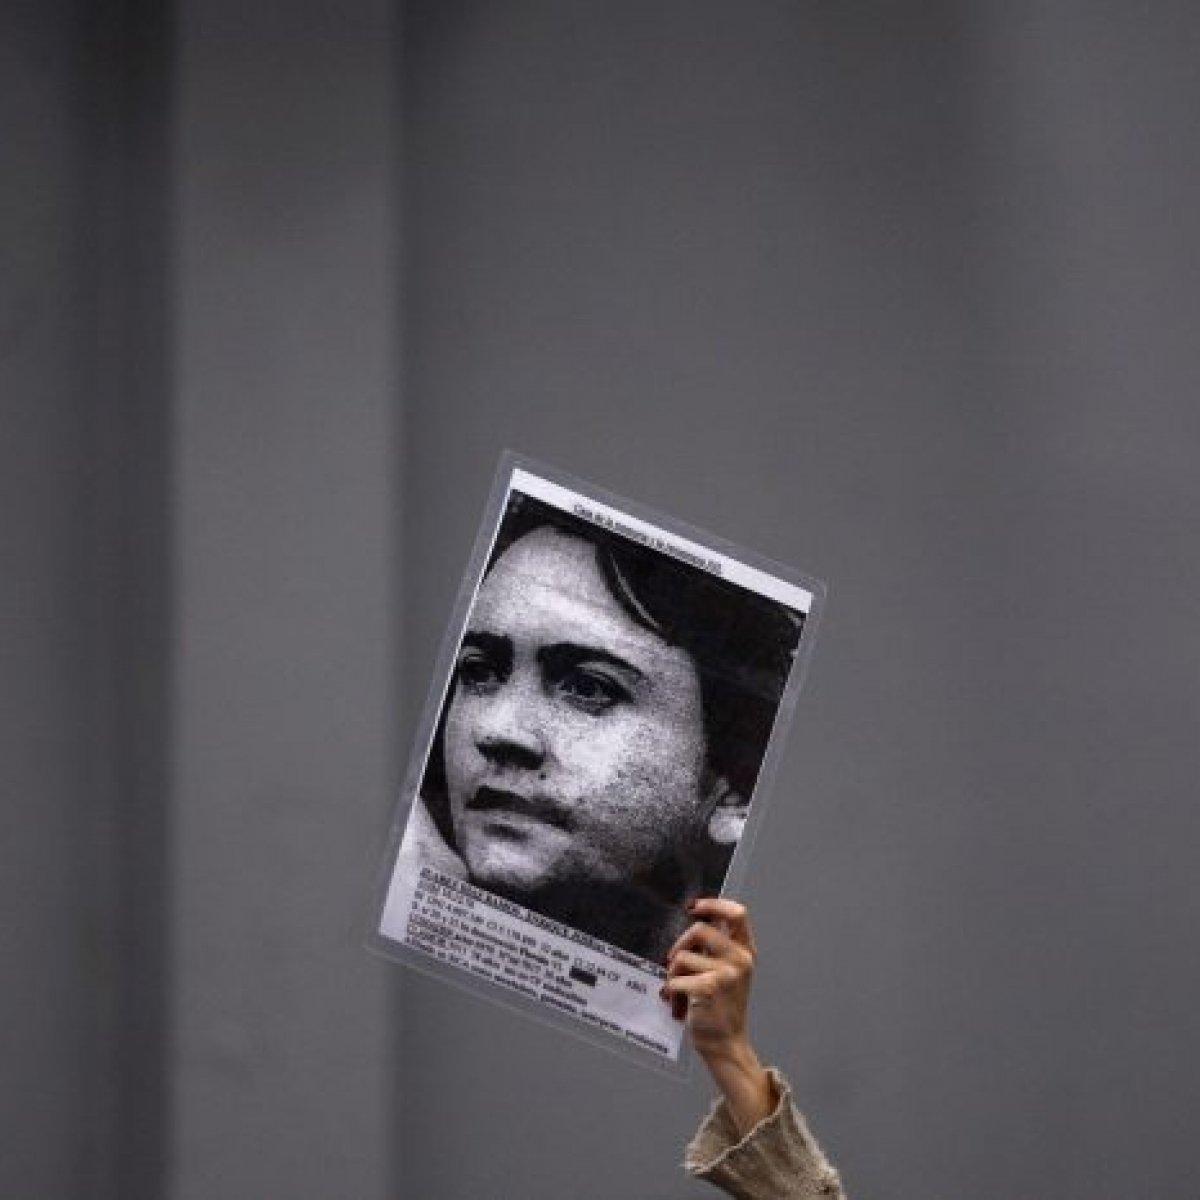 Justiça chilena condena 53 agentes por mortes durante a ditadura